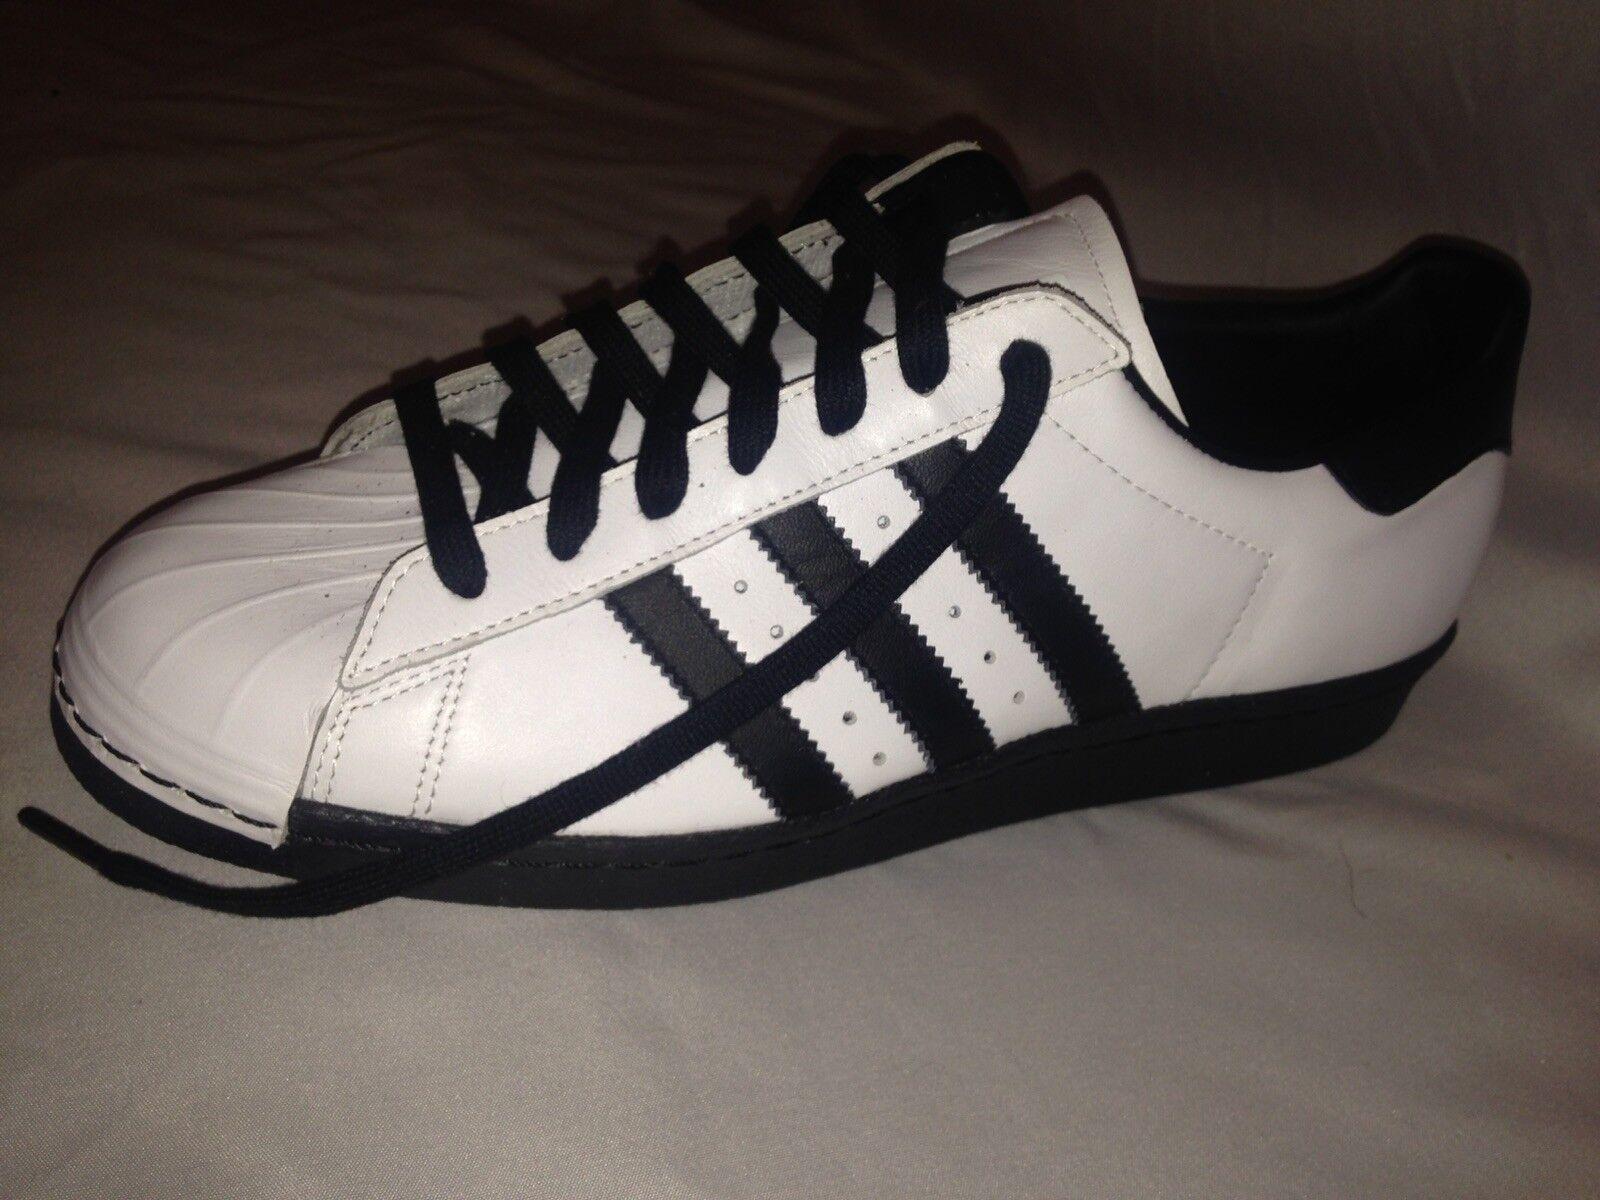 1 Of Blanco) 1 Blanco) Adidas Superstars (Negro  Blanco) Of 1 6595f5 01f12d